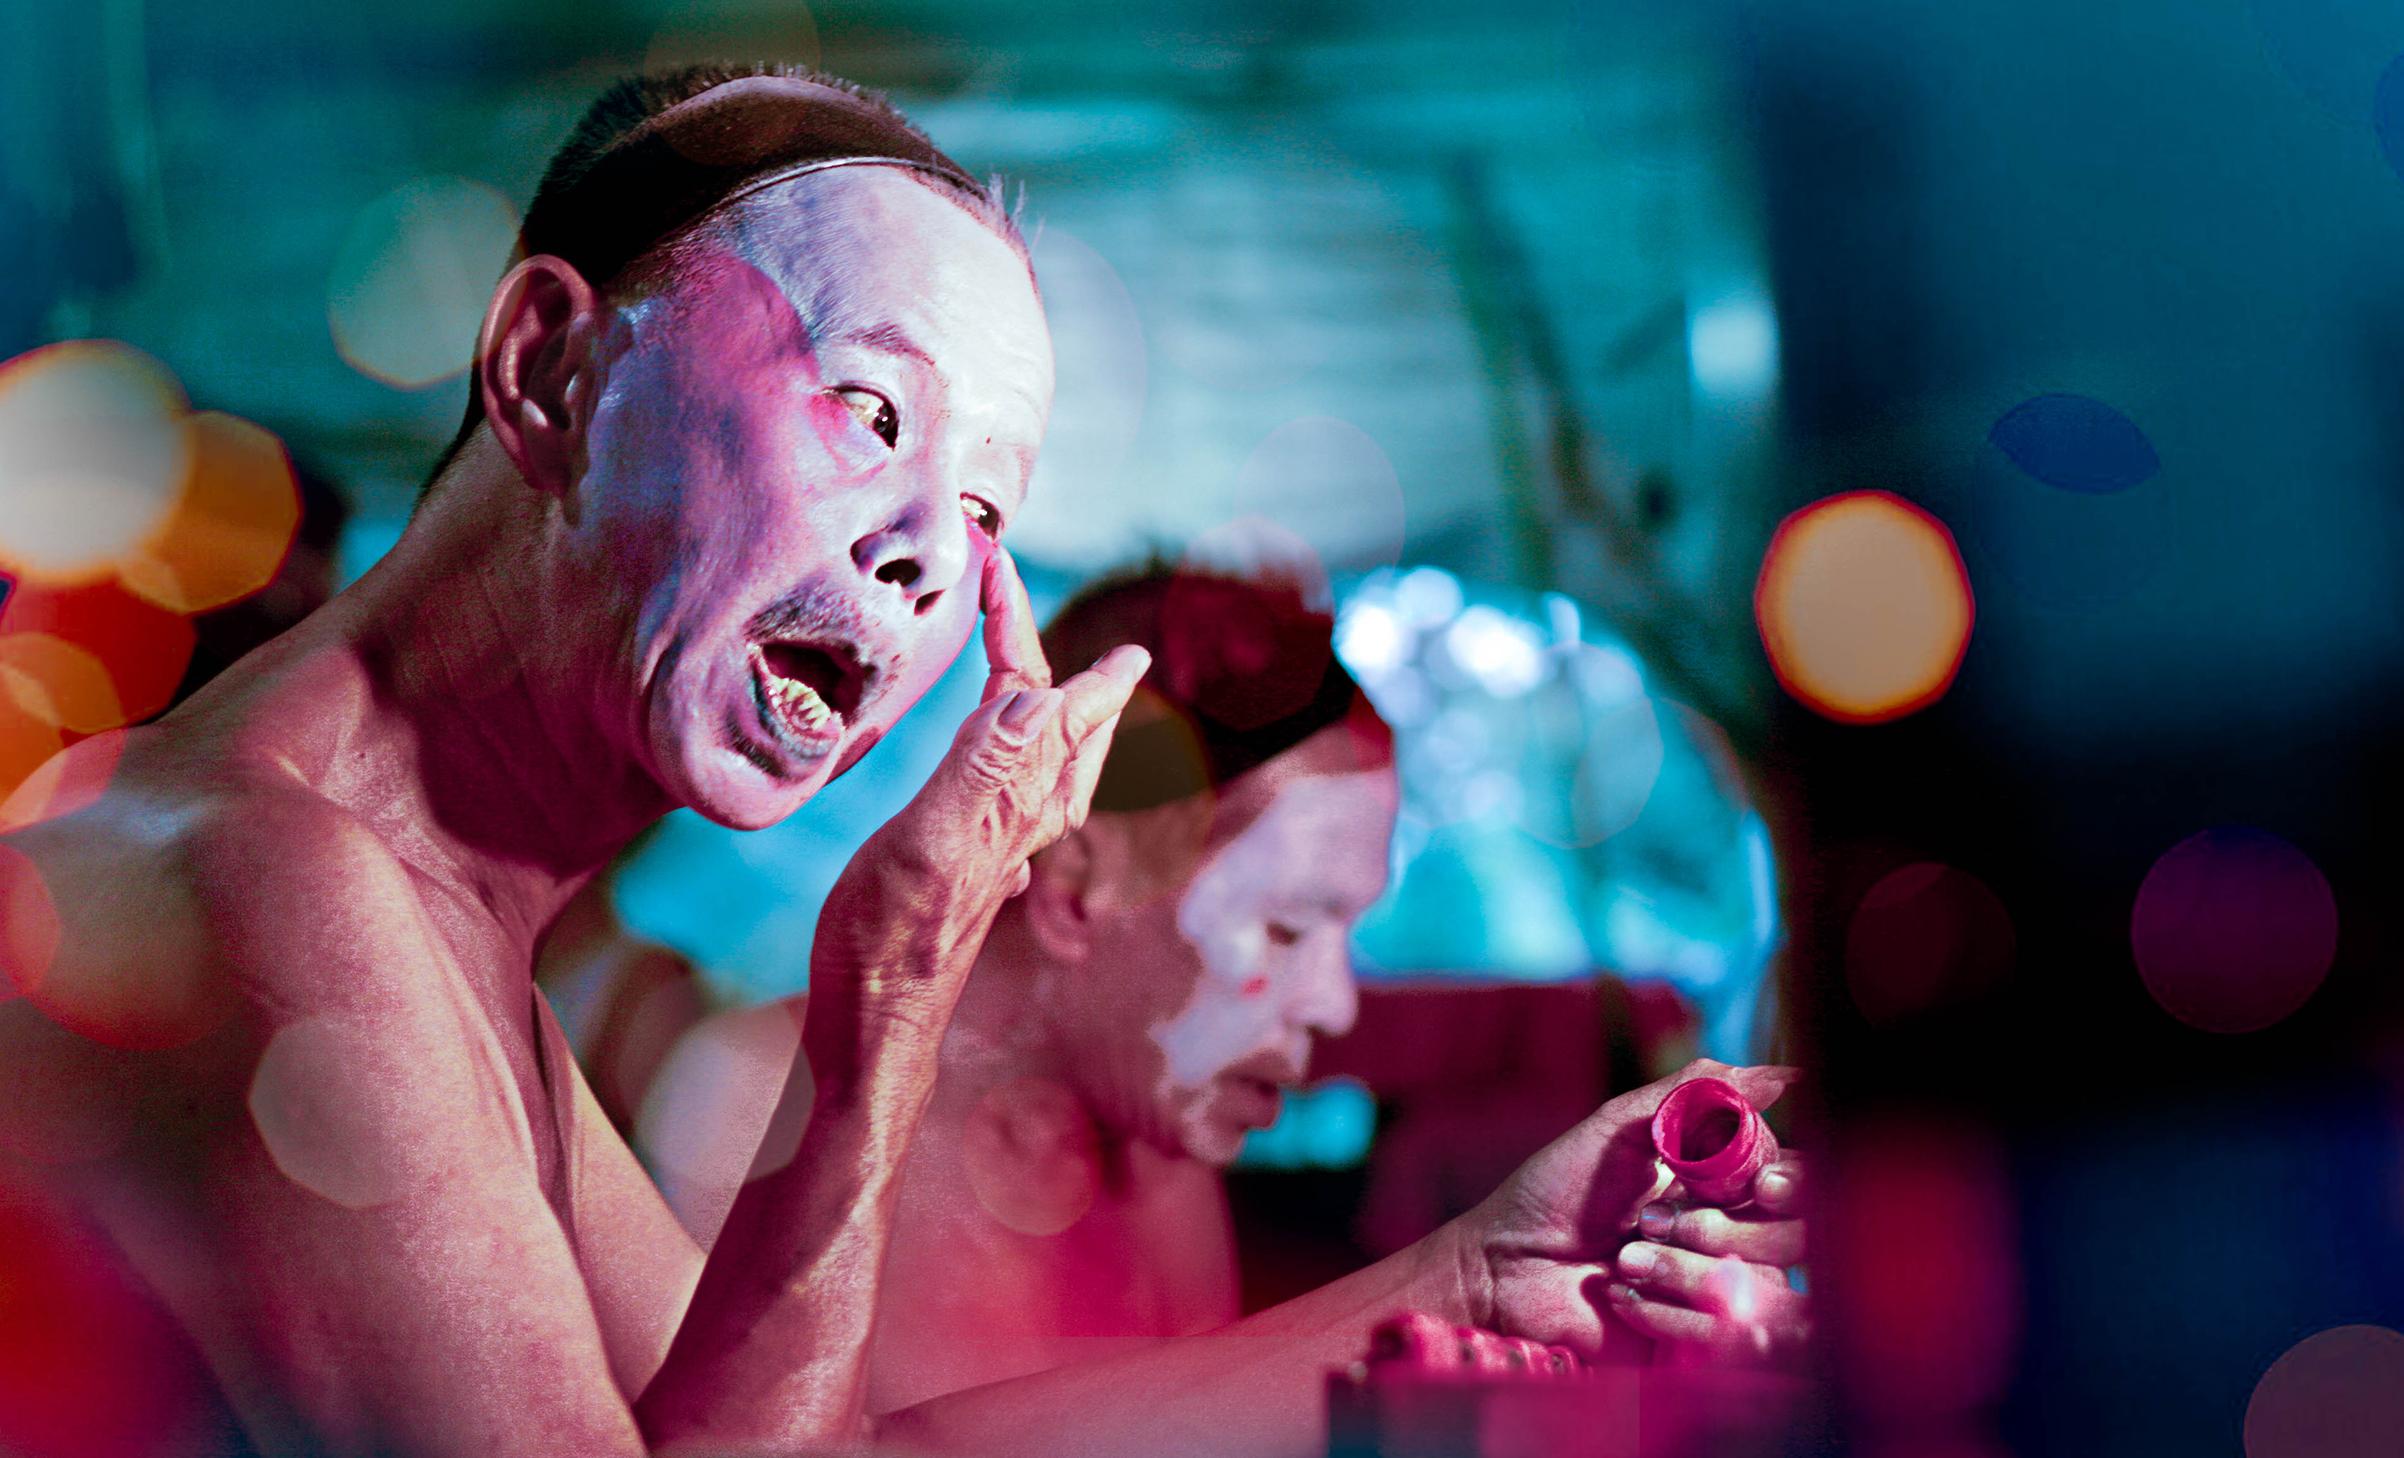 Teo Chew Opera Behind The Scene